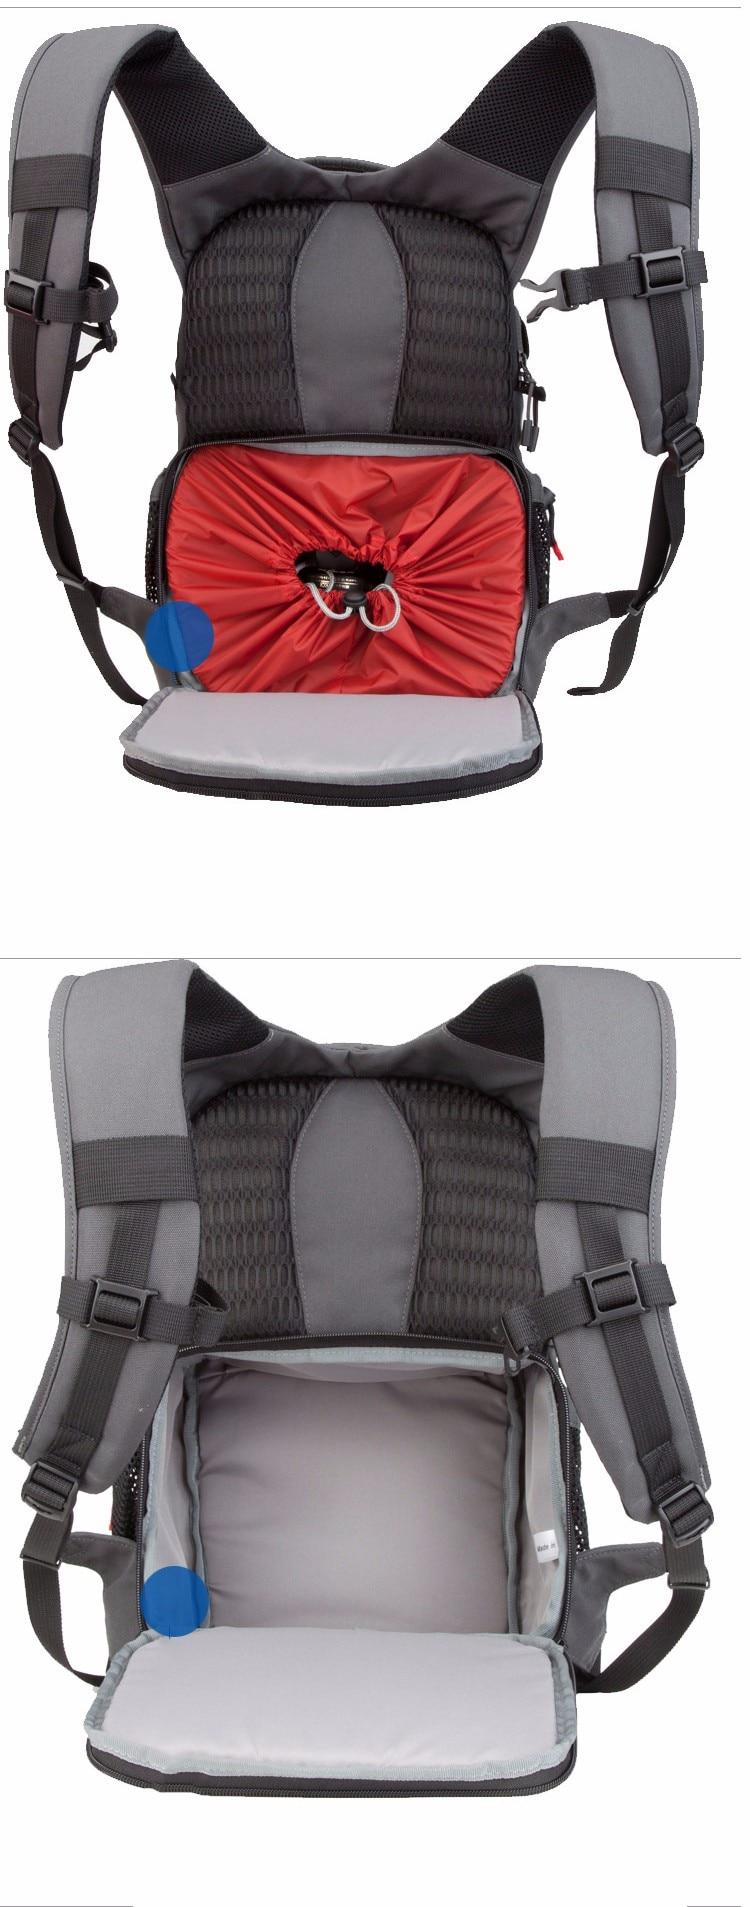 Benro Swift 200 Camera Bag Shoulders Connaught Outdoor Slr Lowepro Flipside 300 Aw Ii Camo Tas Kamera Aeproductgetsubject